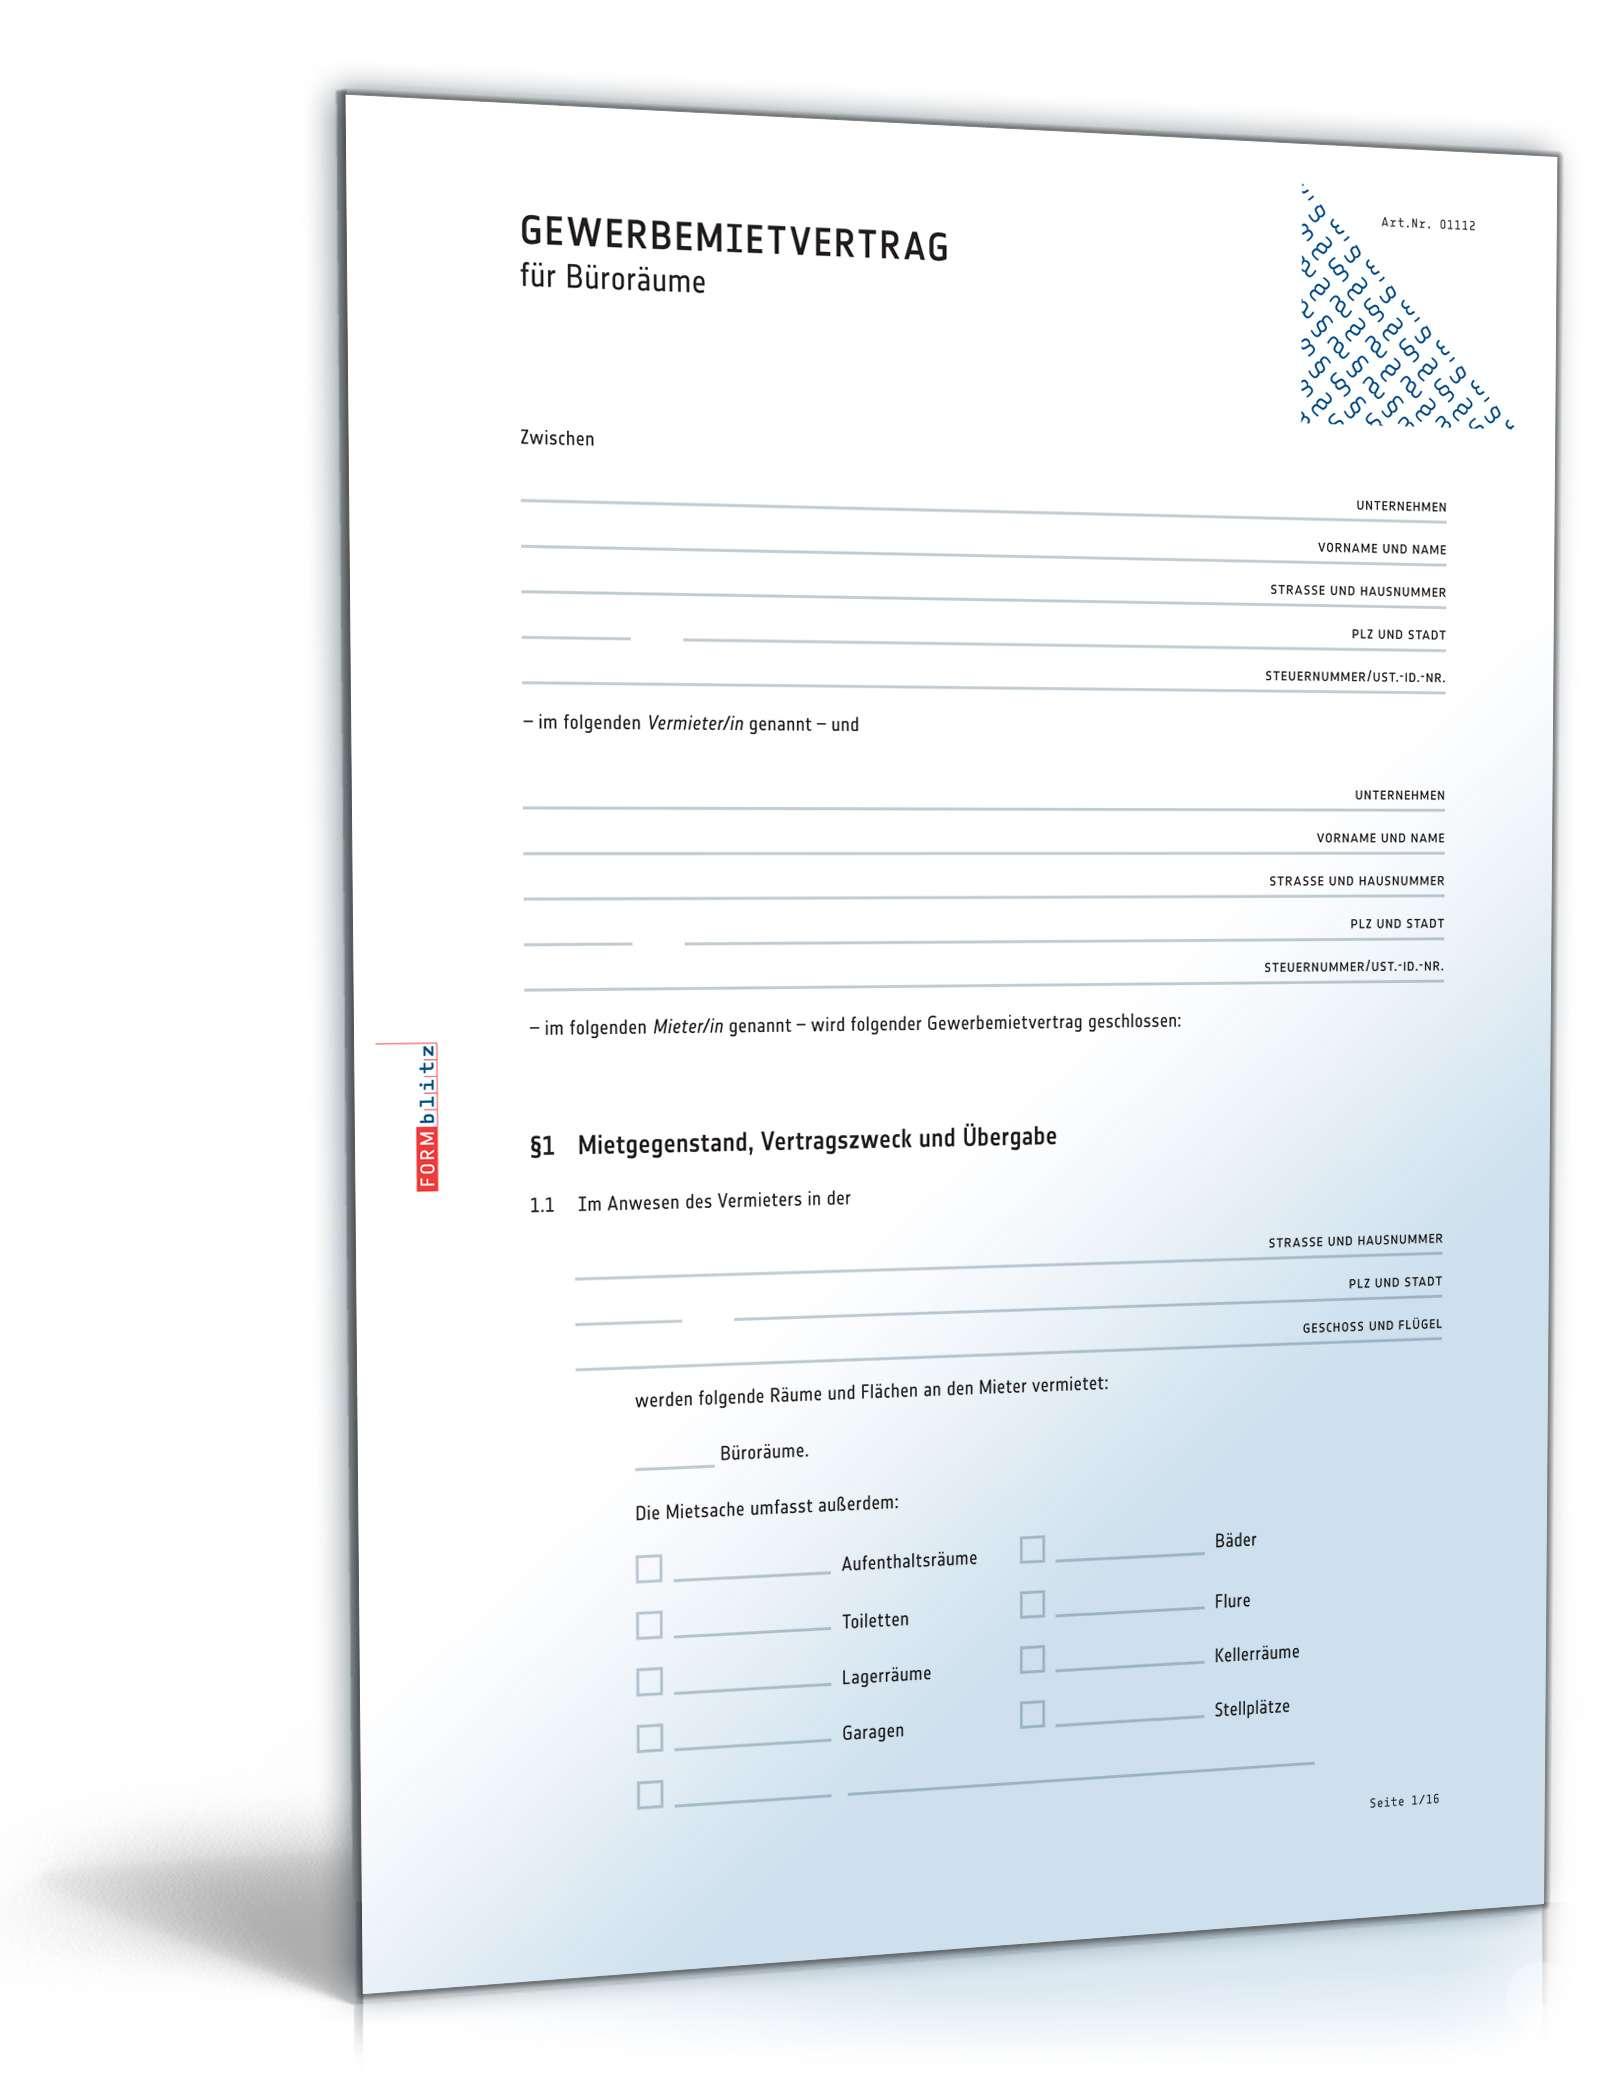 Gewerbemietvertrag Buroraume Rechtssicheres Muster Downloaden